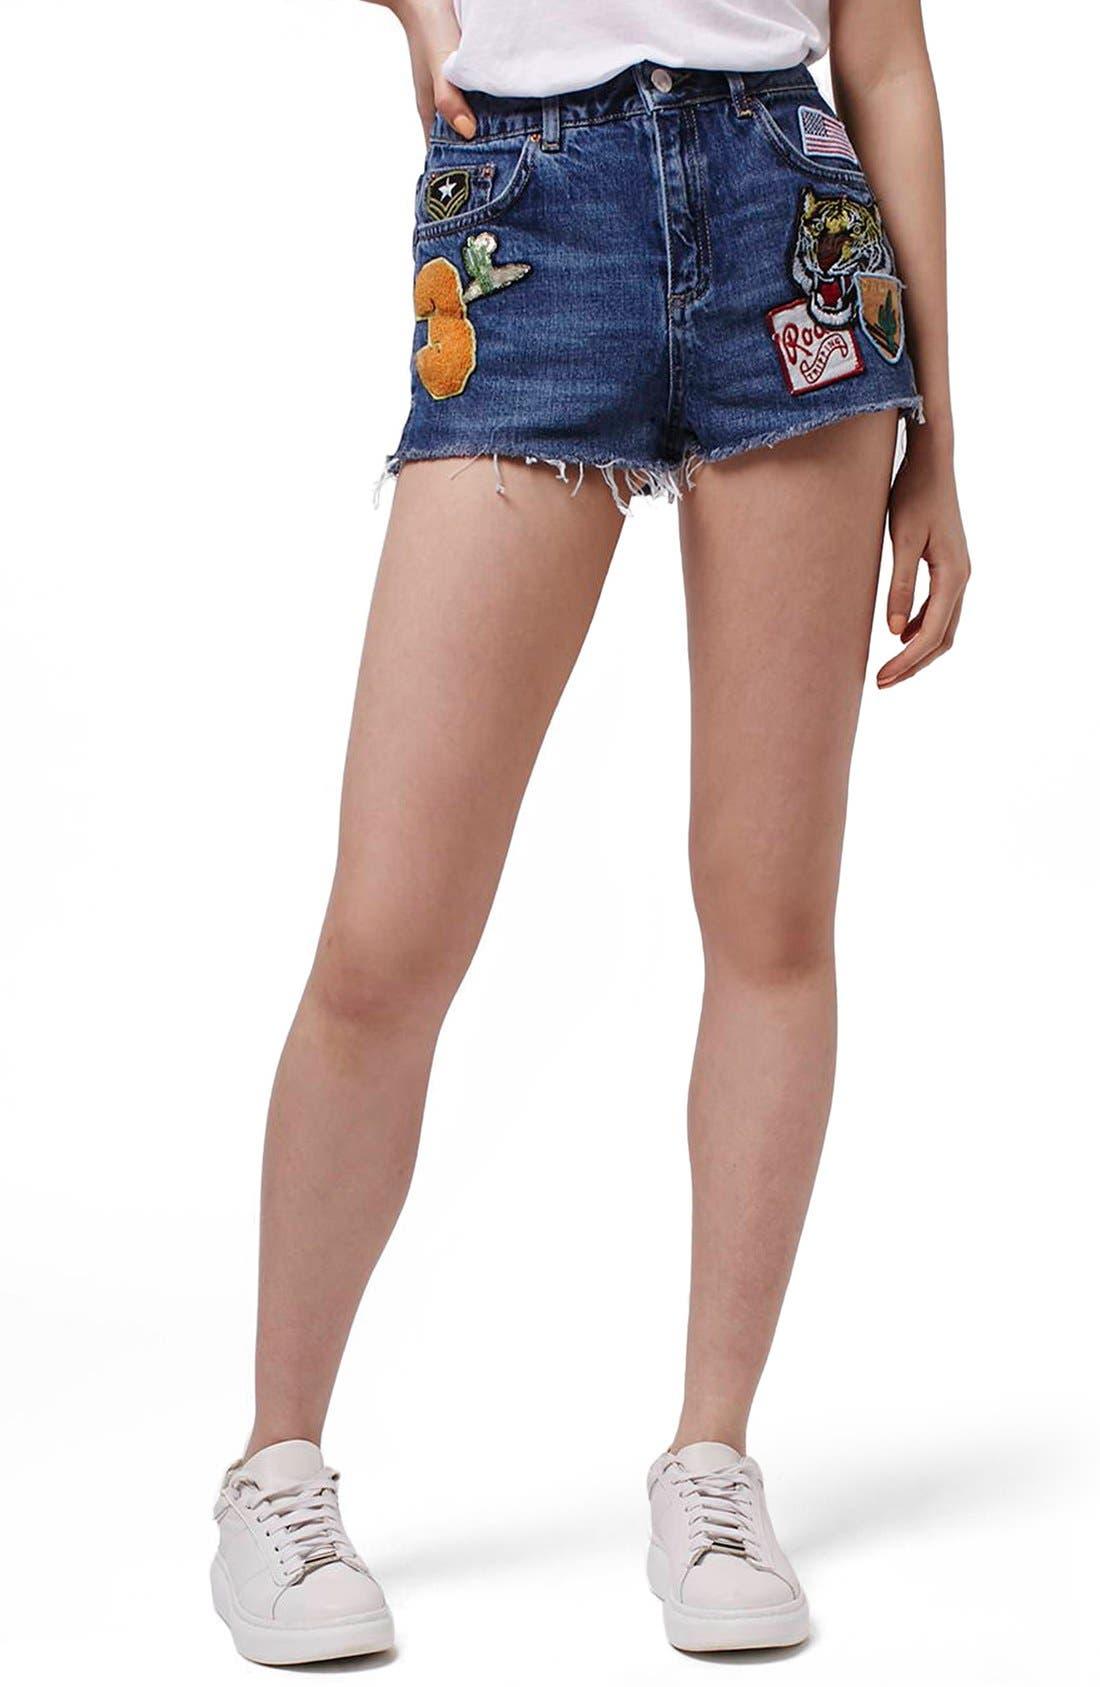 Alternate Image 1 Selected - Topshop Patch Raw Hem High Rise Jean Shorts (Petite)